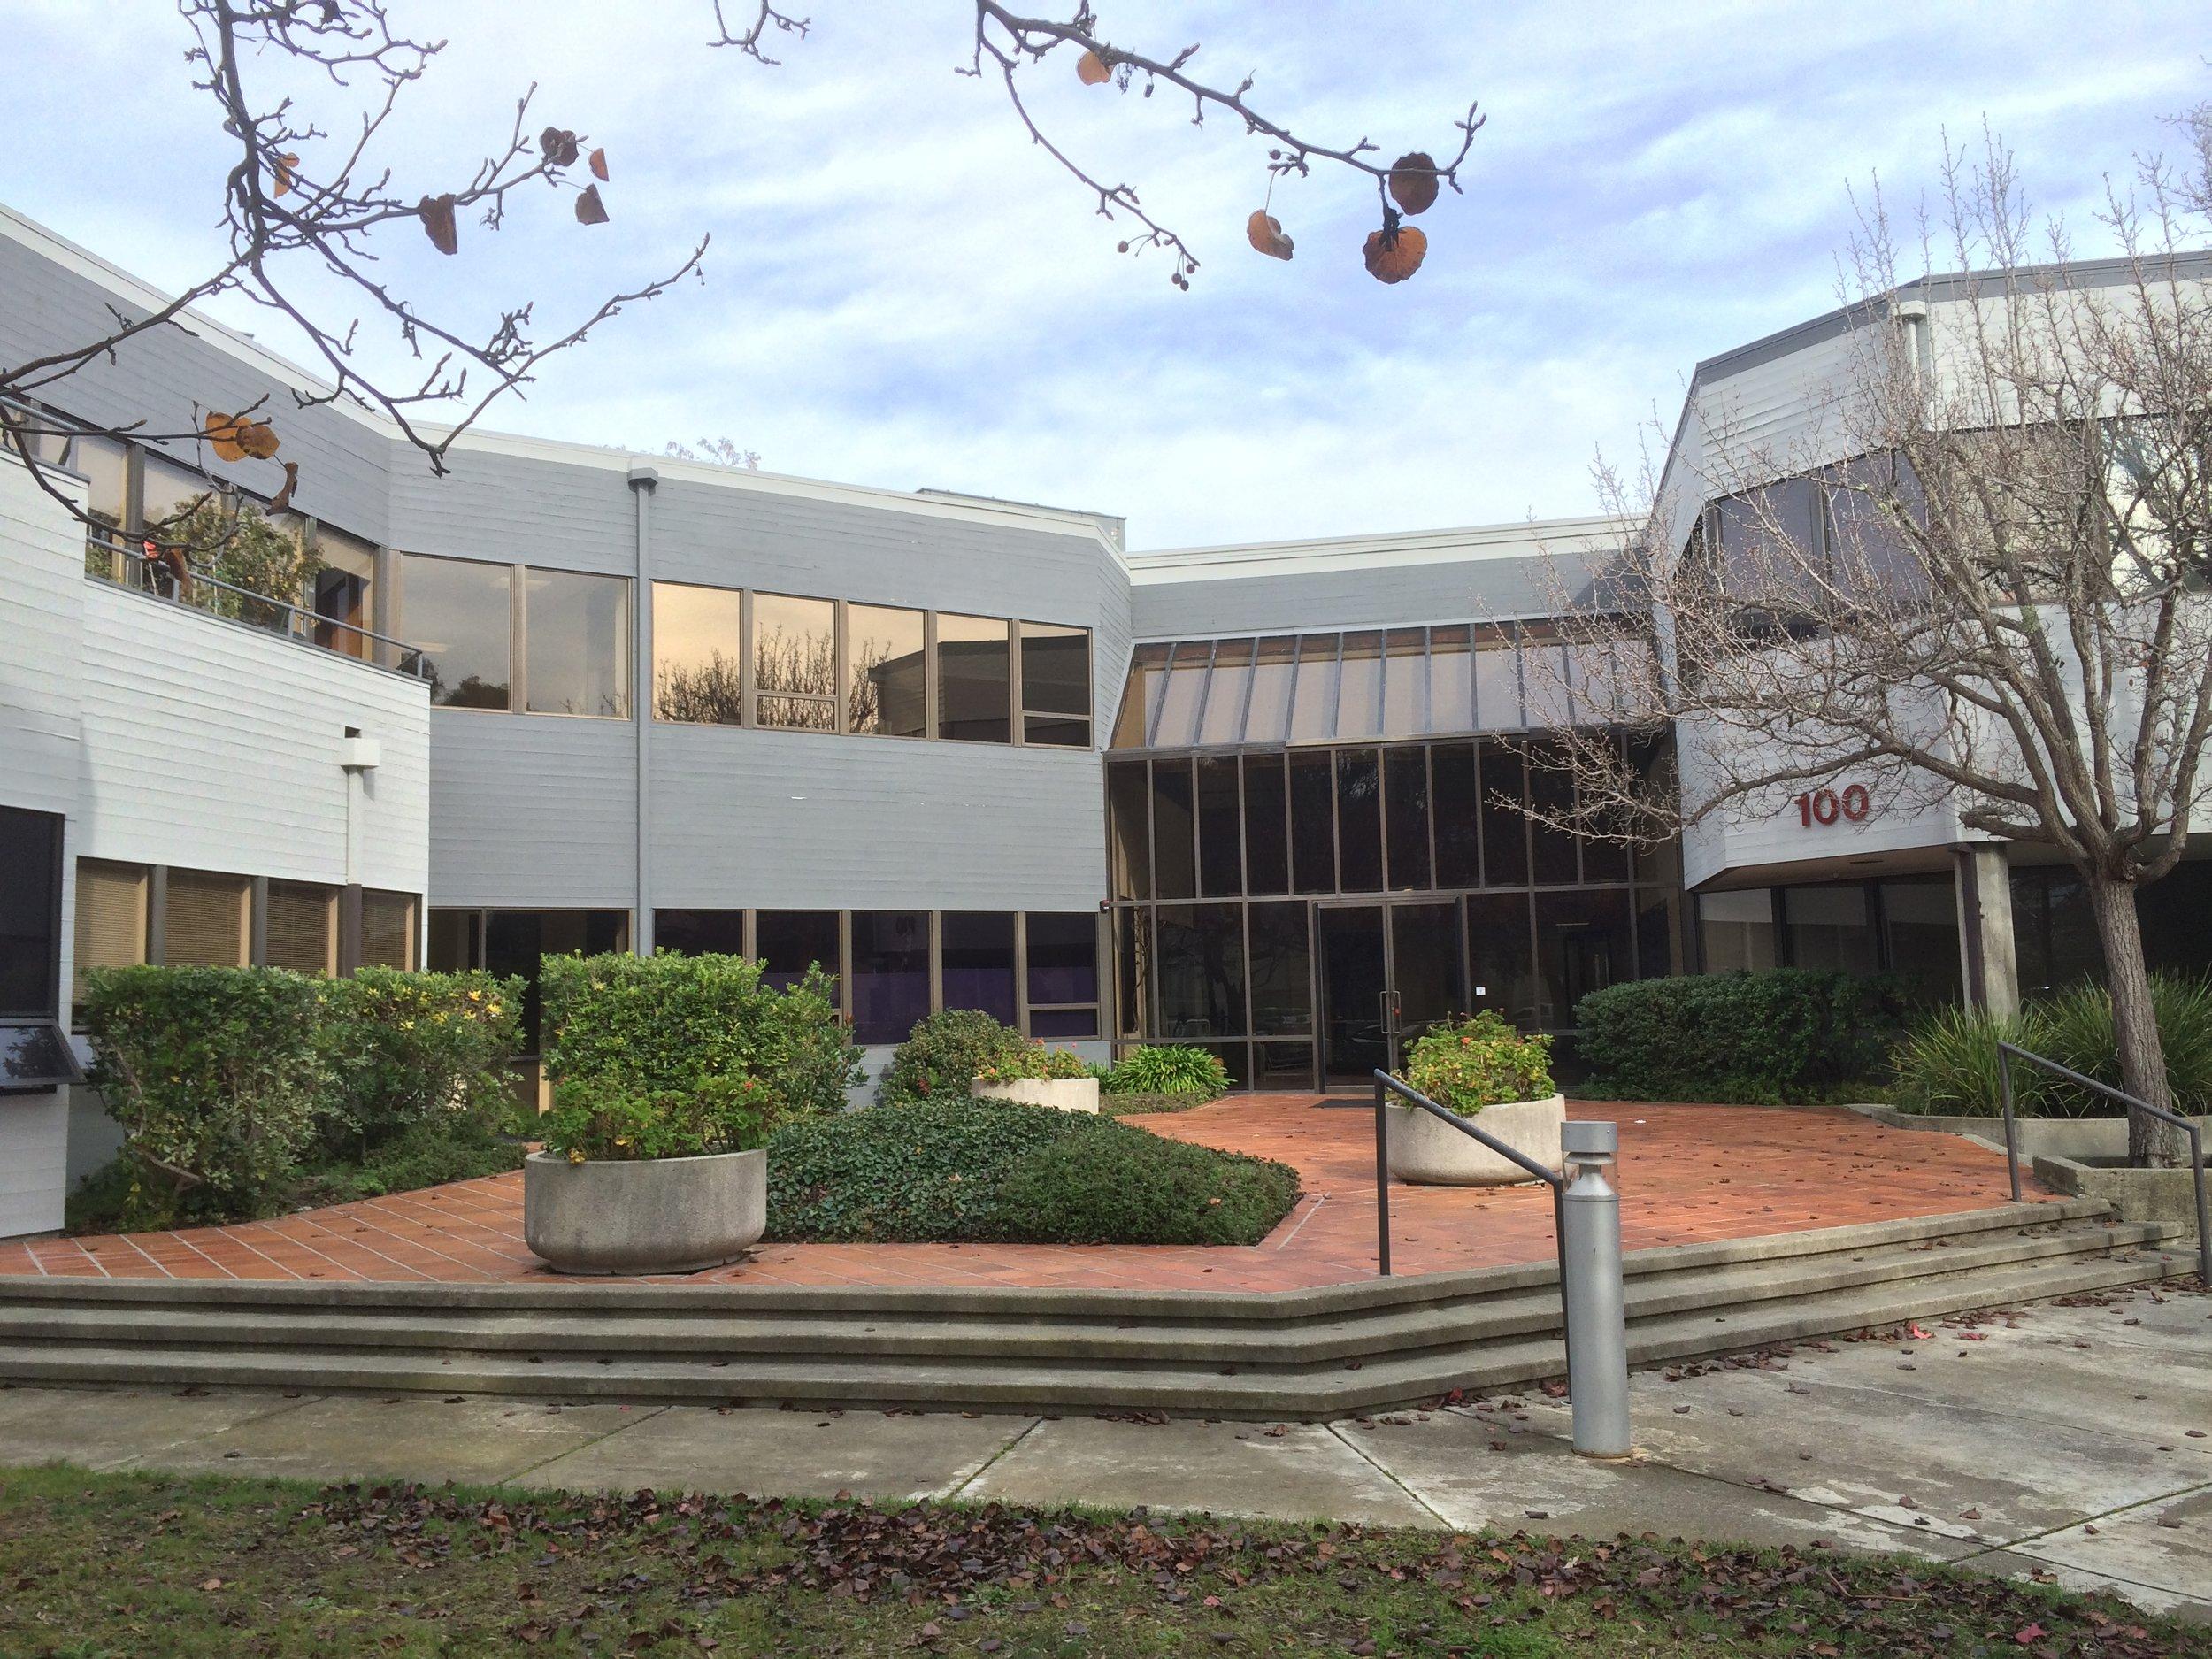 100 Tamal Vista Boulevard, Corte Madera, CA 94925 21,343 SF Office $8,200,000